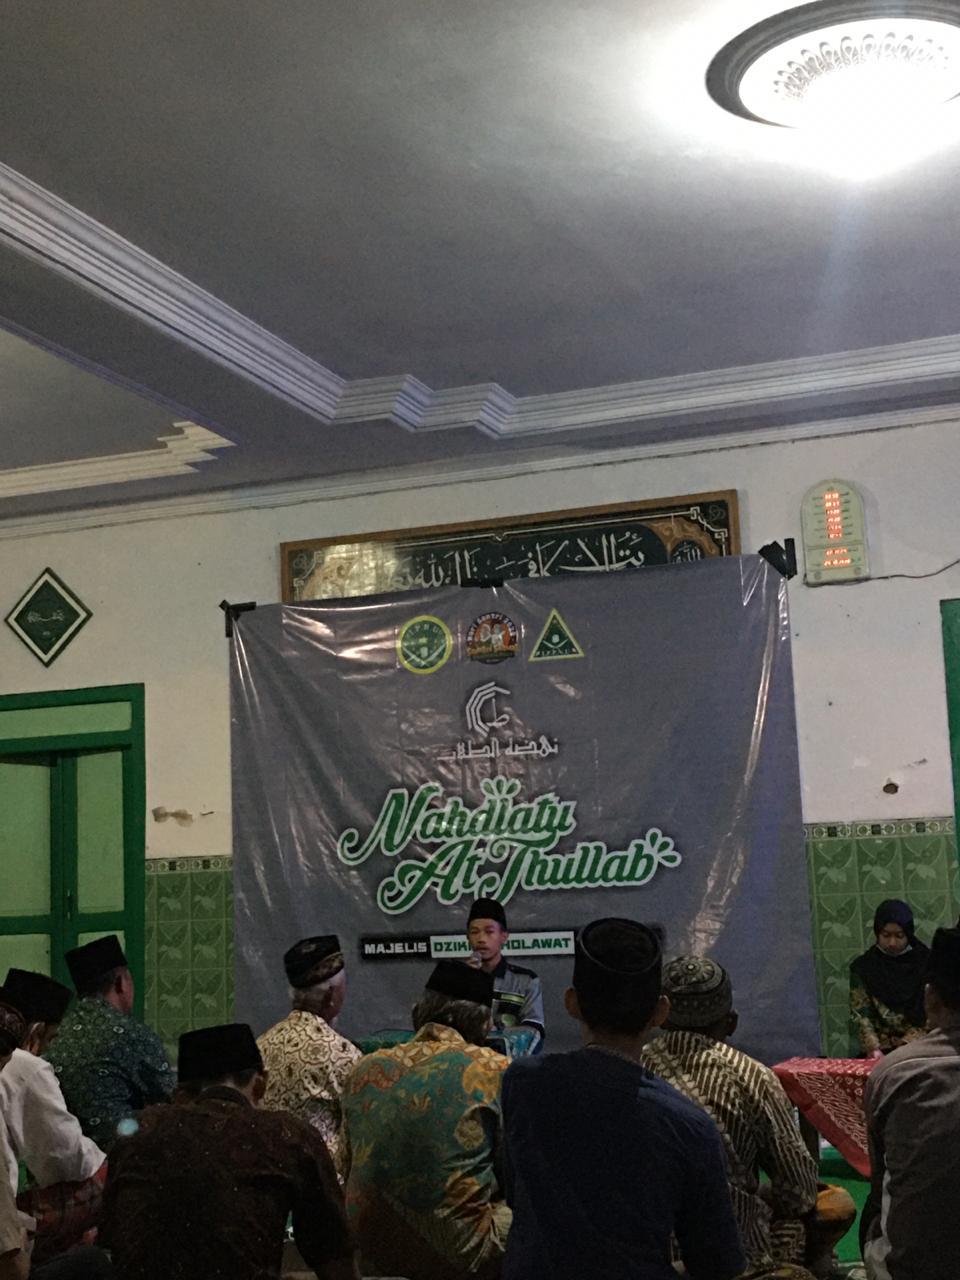 Jamaah masjid ikut serta pada acara majlis dzikir dan taklim Nahdlatu At-Thullab yang digelar PAC IPNU- IPPNU Sukorejo